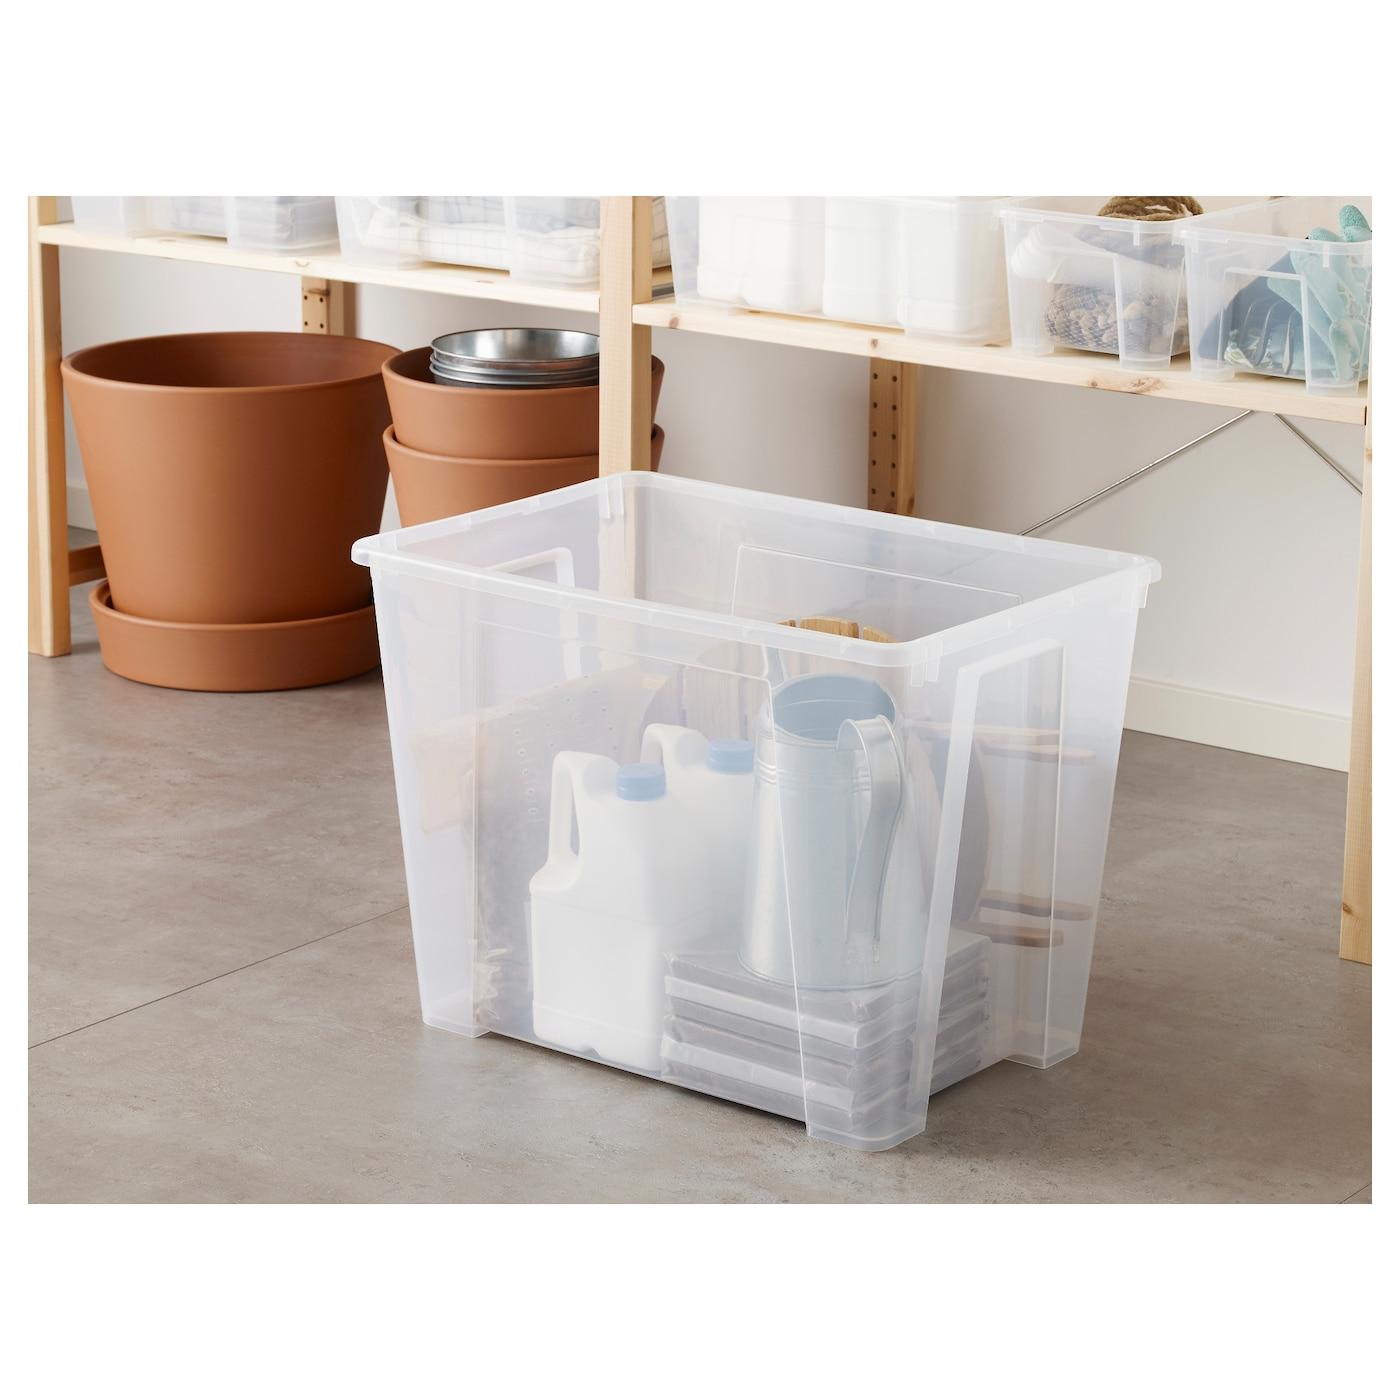 samla box transparent 56 x 39 x 42 cm 65 l ikea. Black Bedroom Furniture Sets. Home Design Ideas